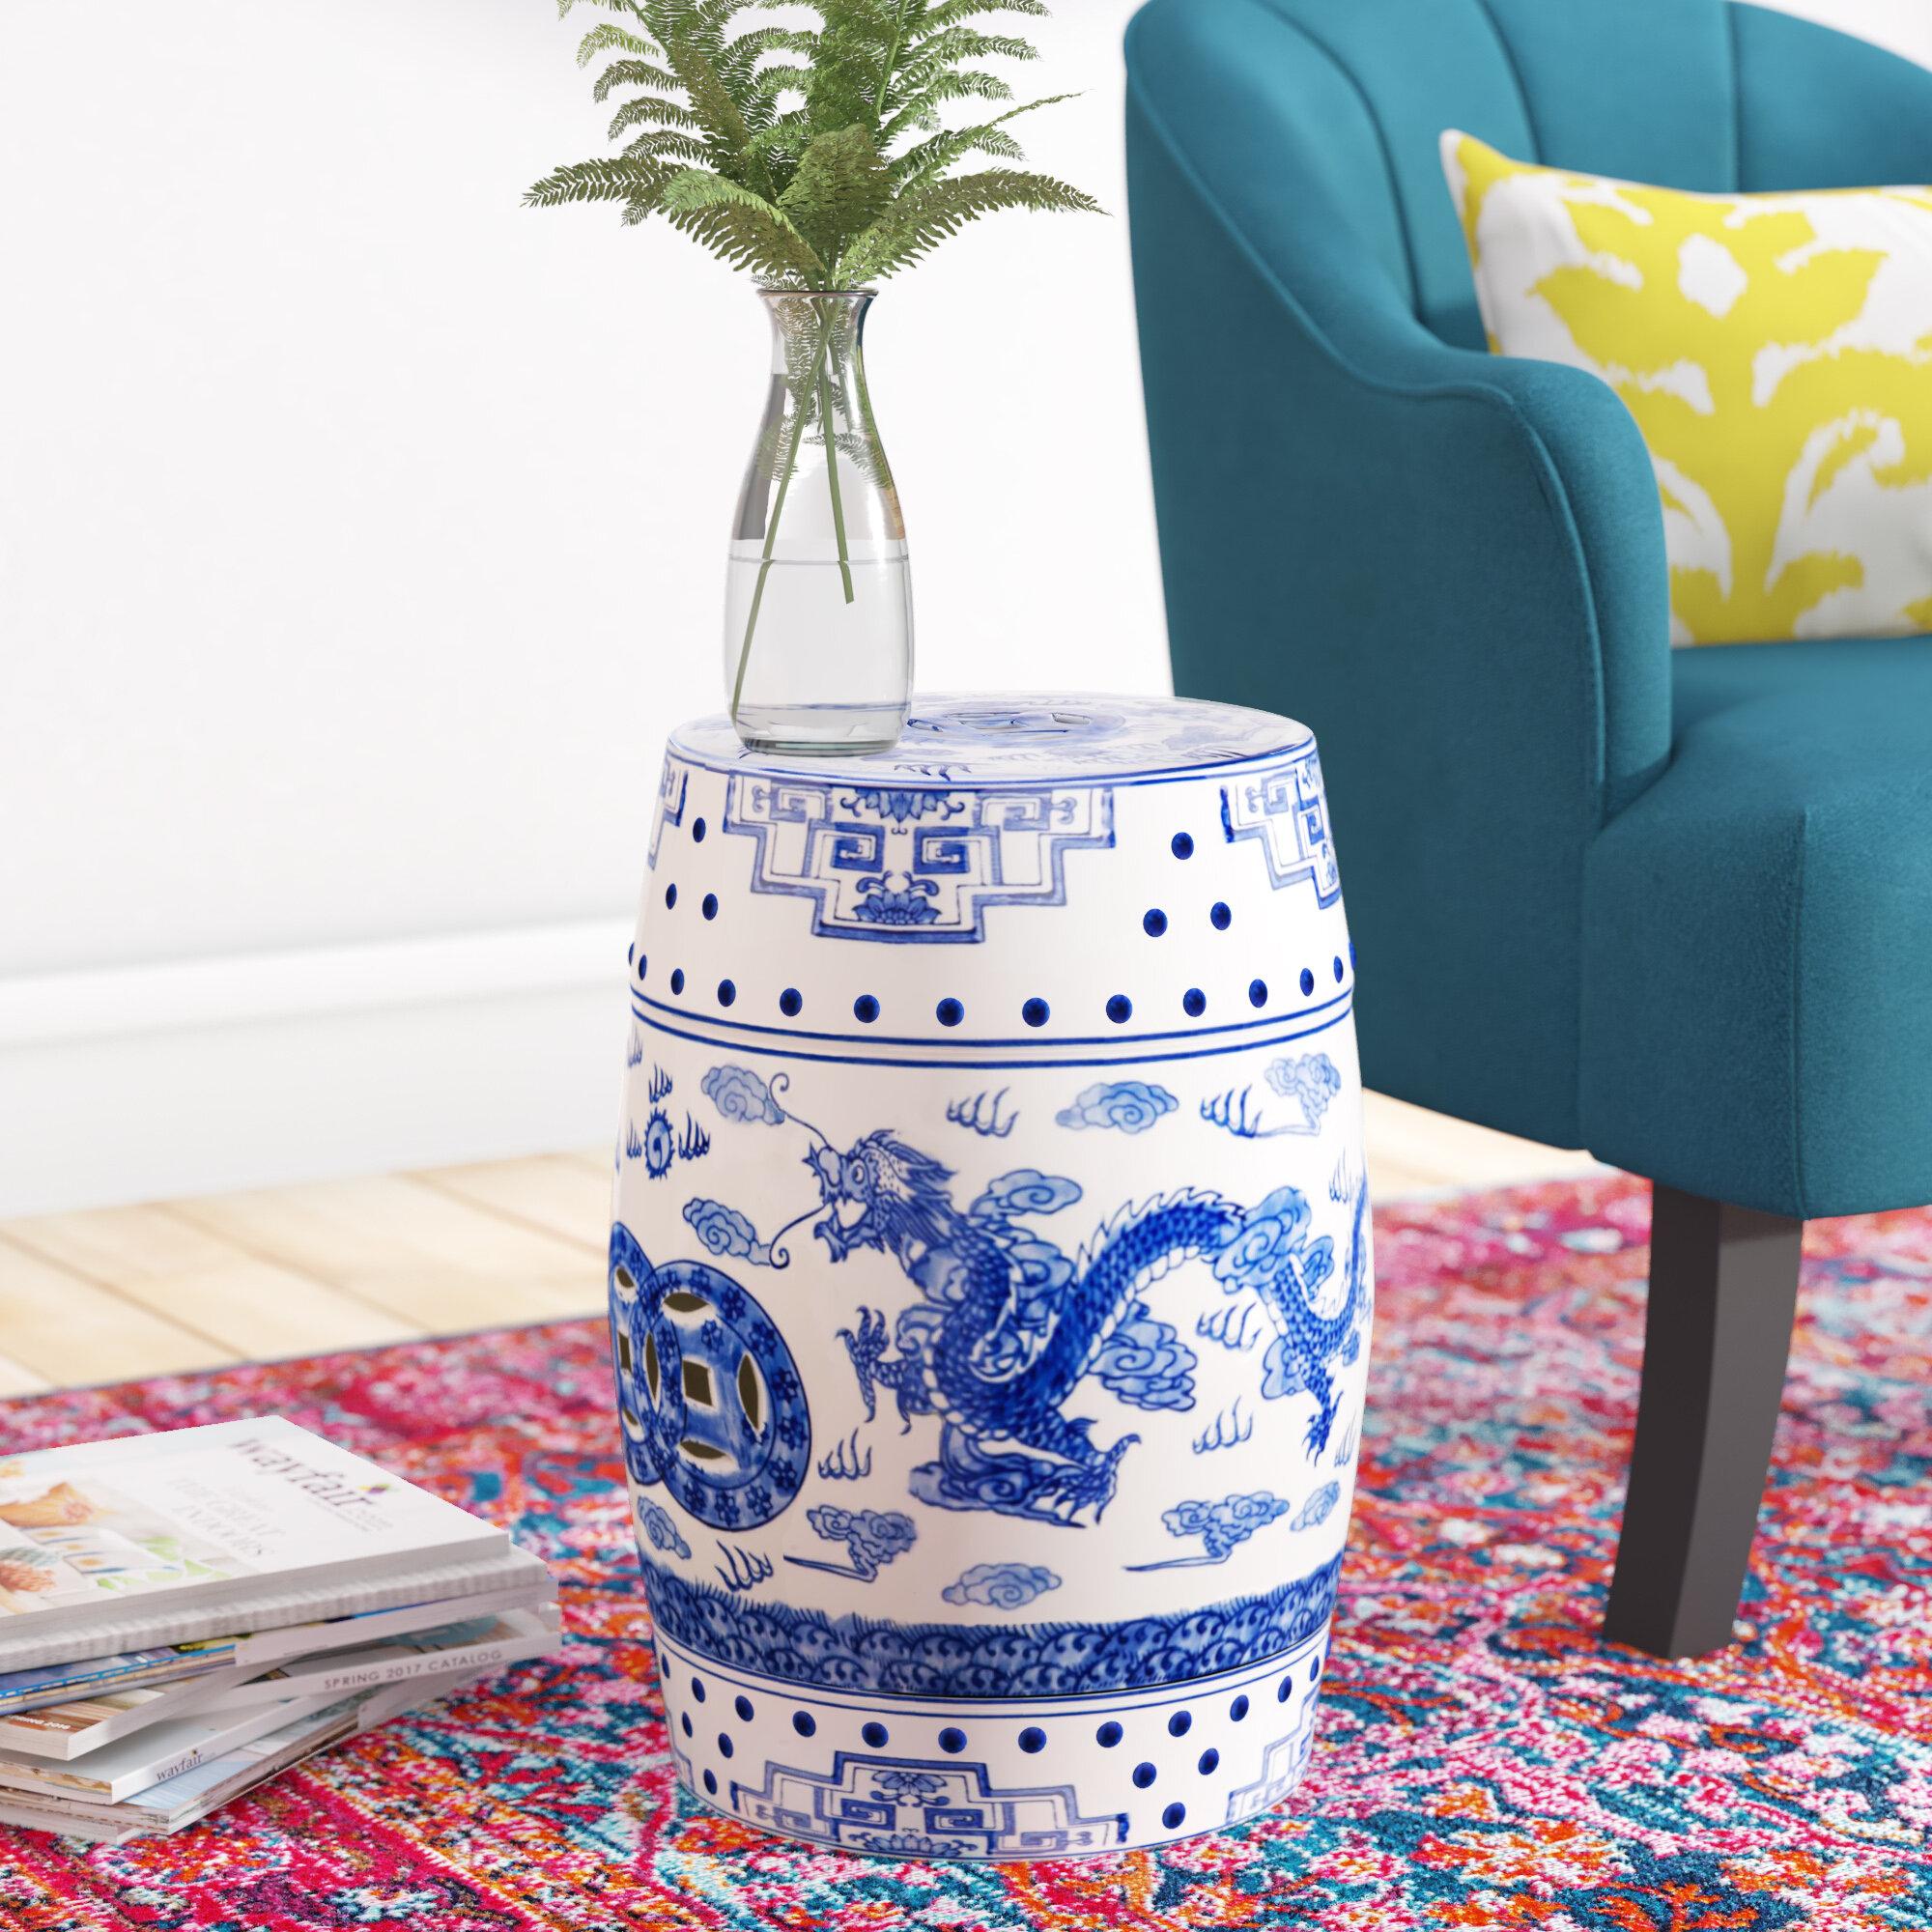 Garden Stools | Wayfair For Wiese Cherry Blossom Ceramic Garden Stools (View 5 of 25)